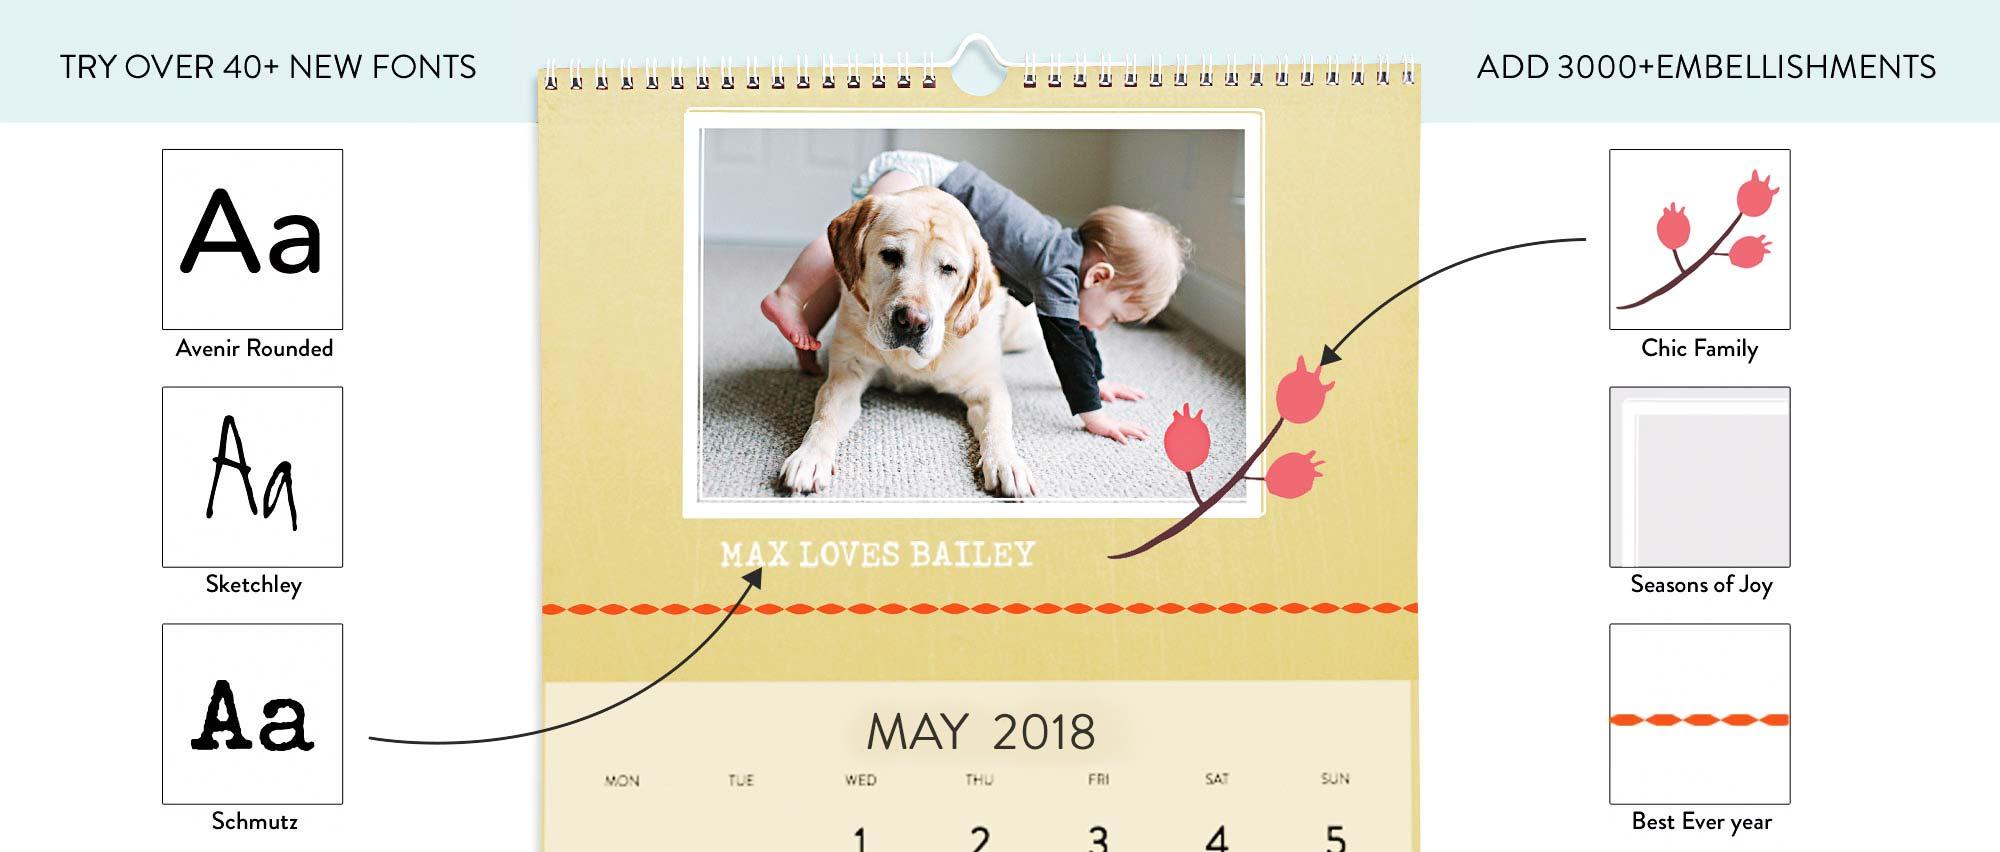 Calendar fonts and embellishments